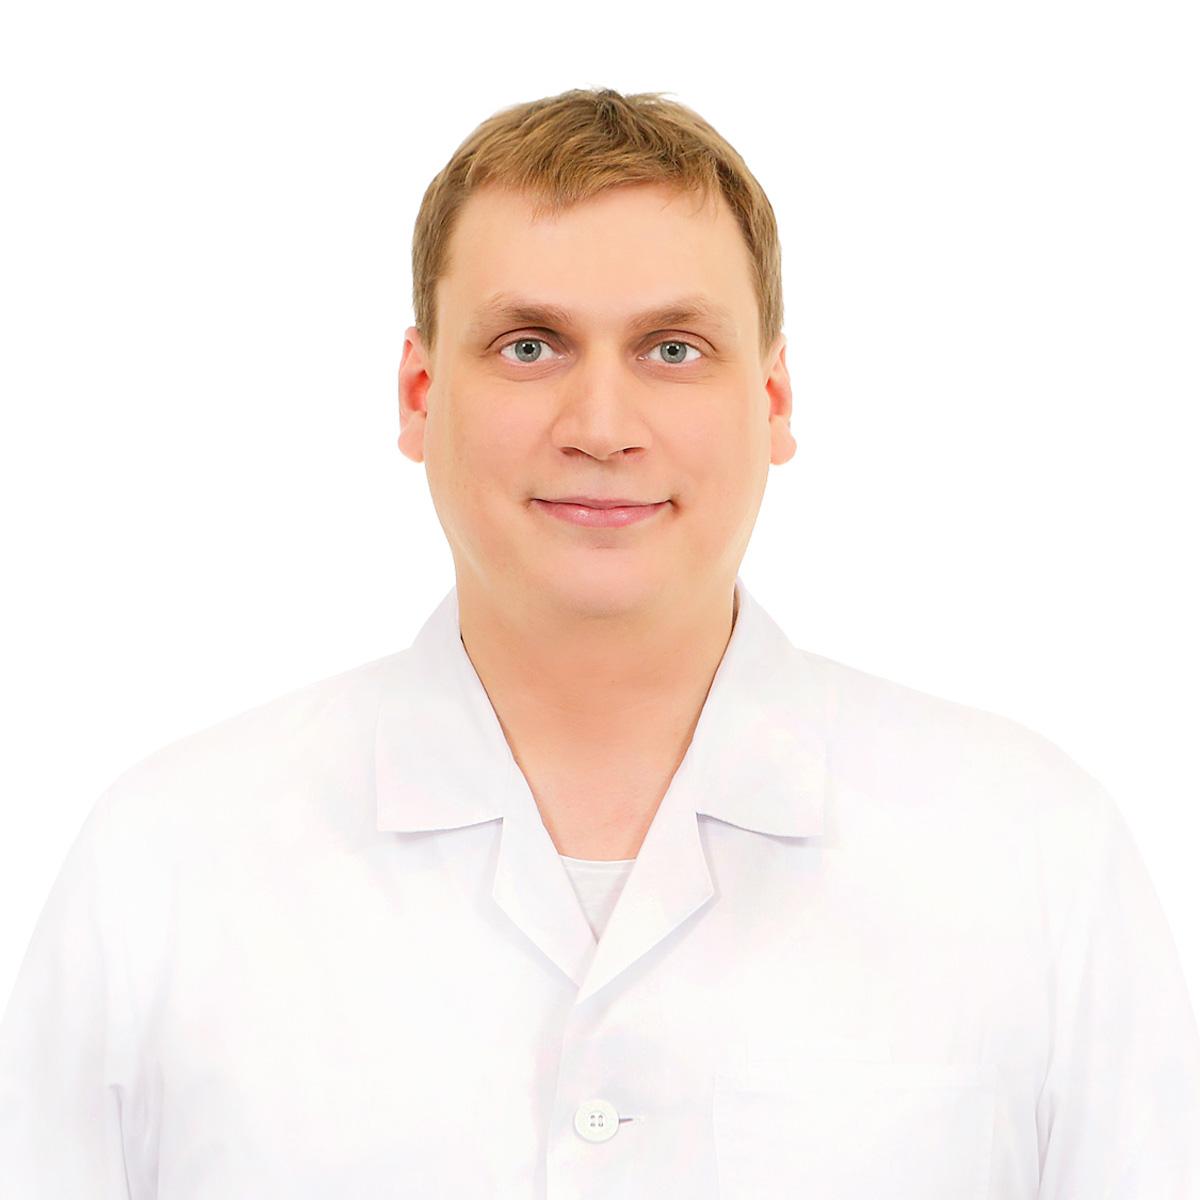 Щетинин Сергей Алексеевич